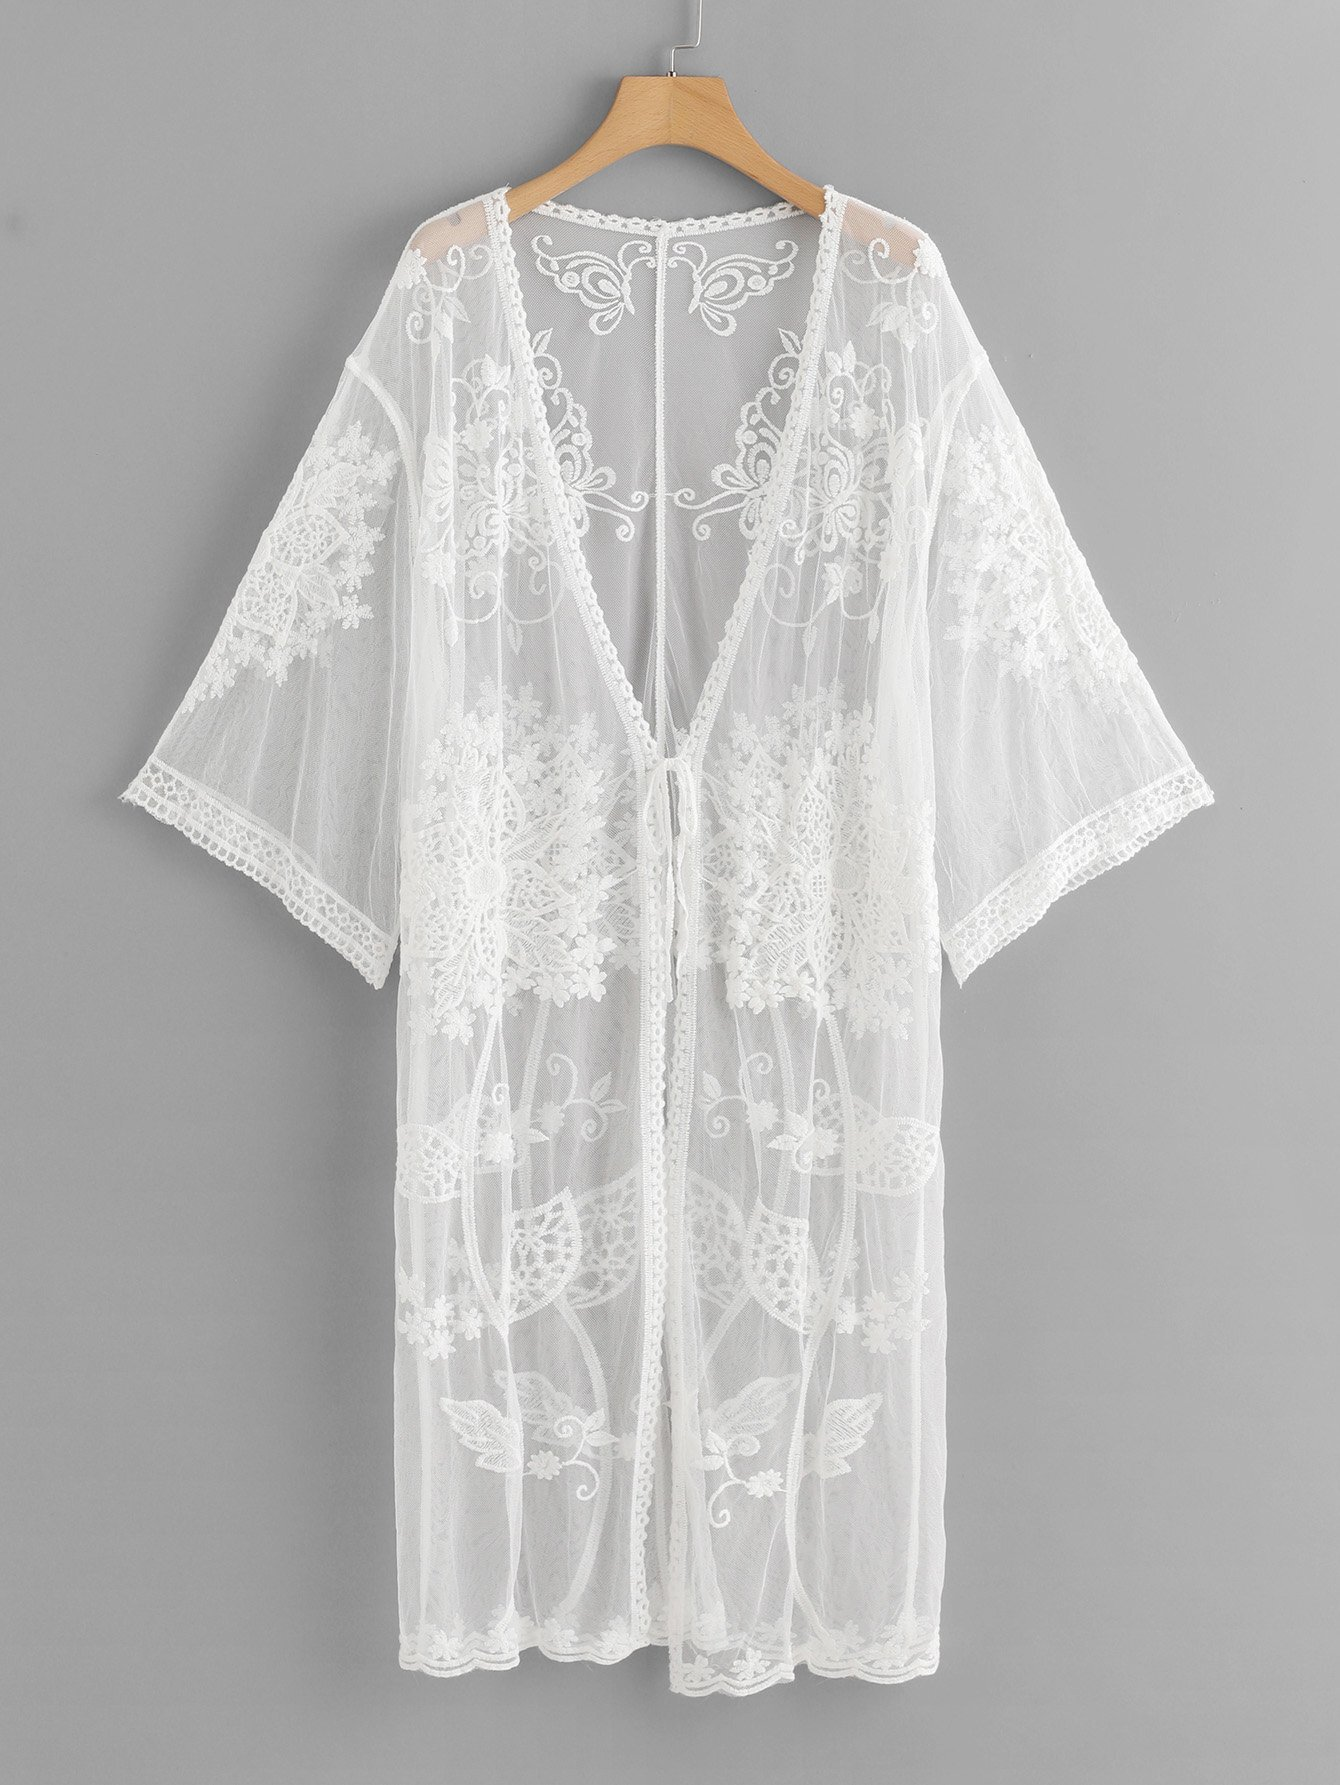 Lace Floral Embroidery Sheer Mesh Panel Kimono slit side asymmetrical hem embroidery mesh kimono